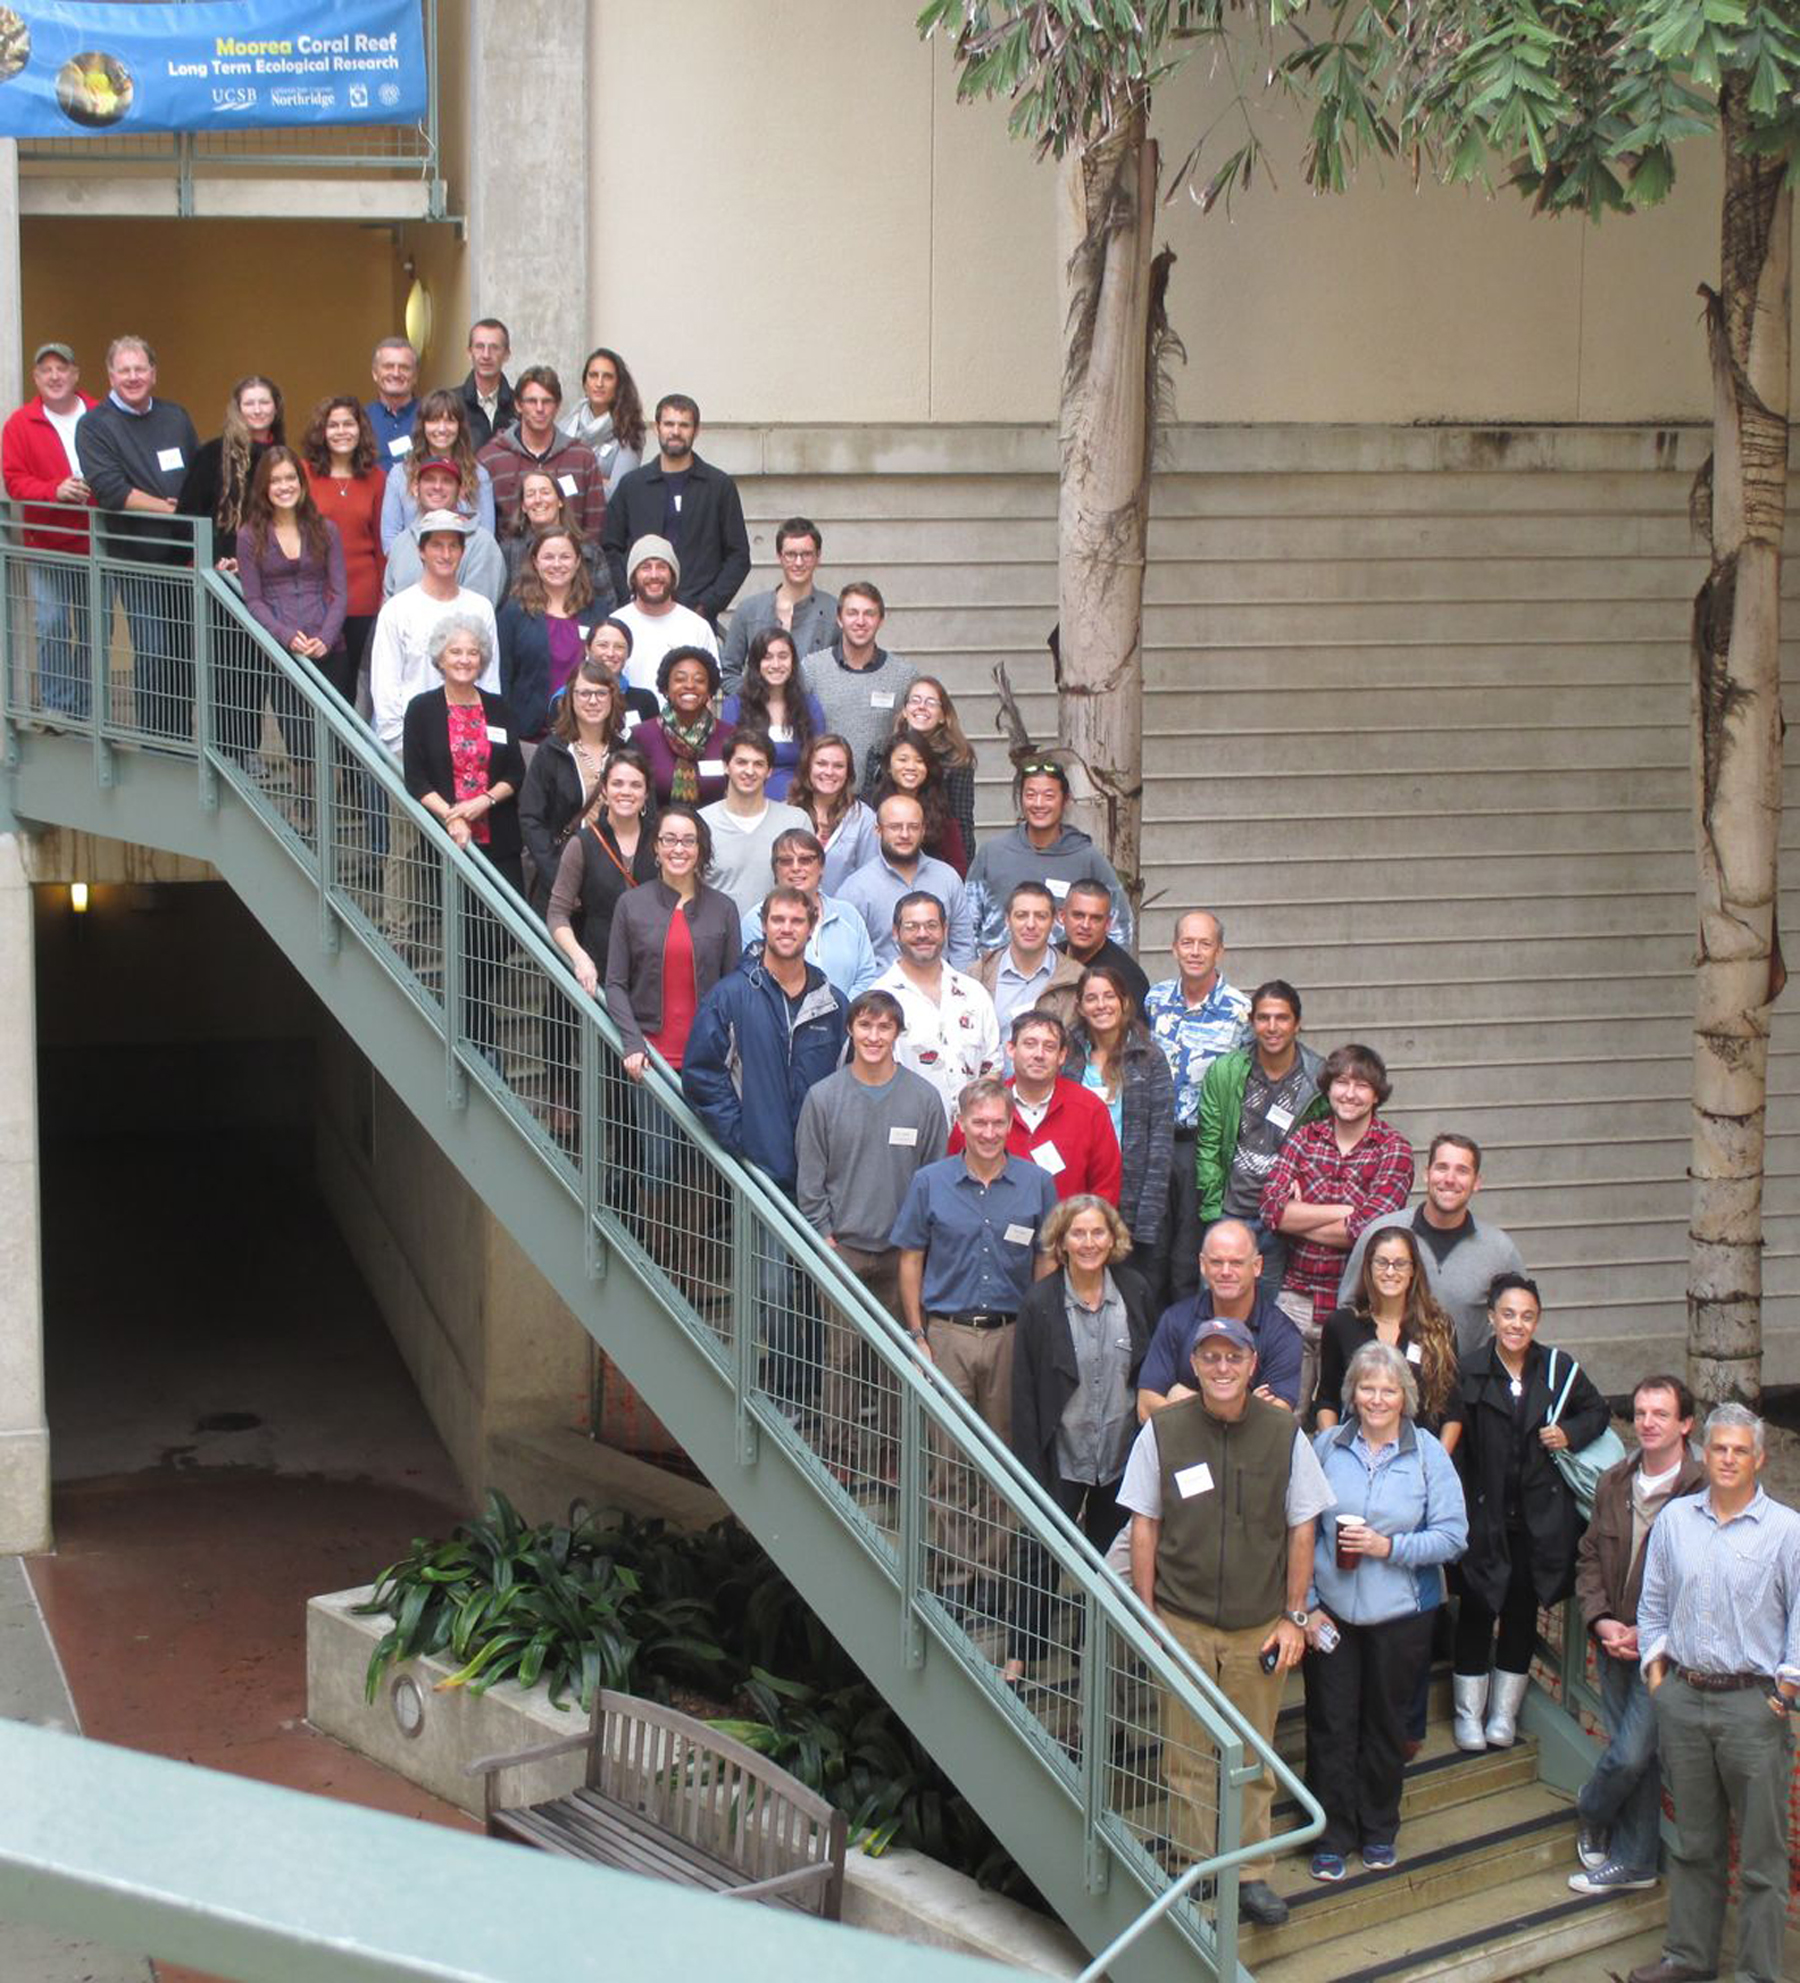 2014 MCR All Investigators Meeting photo